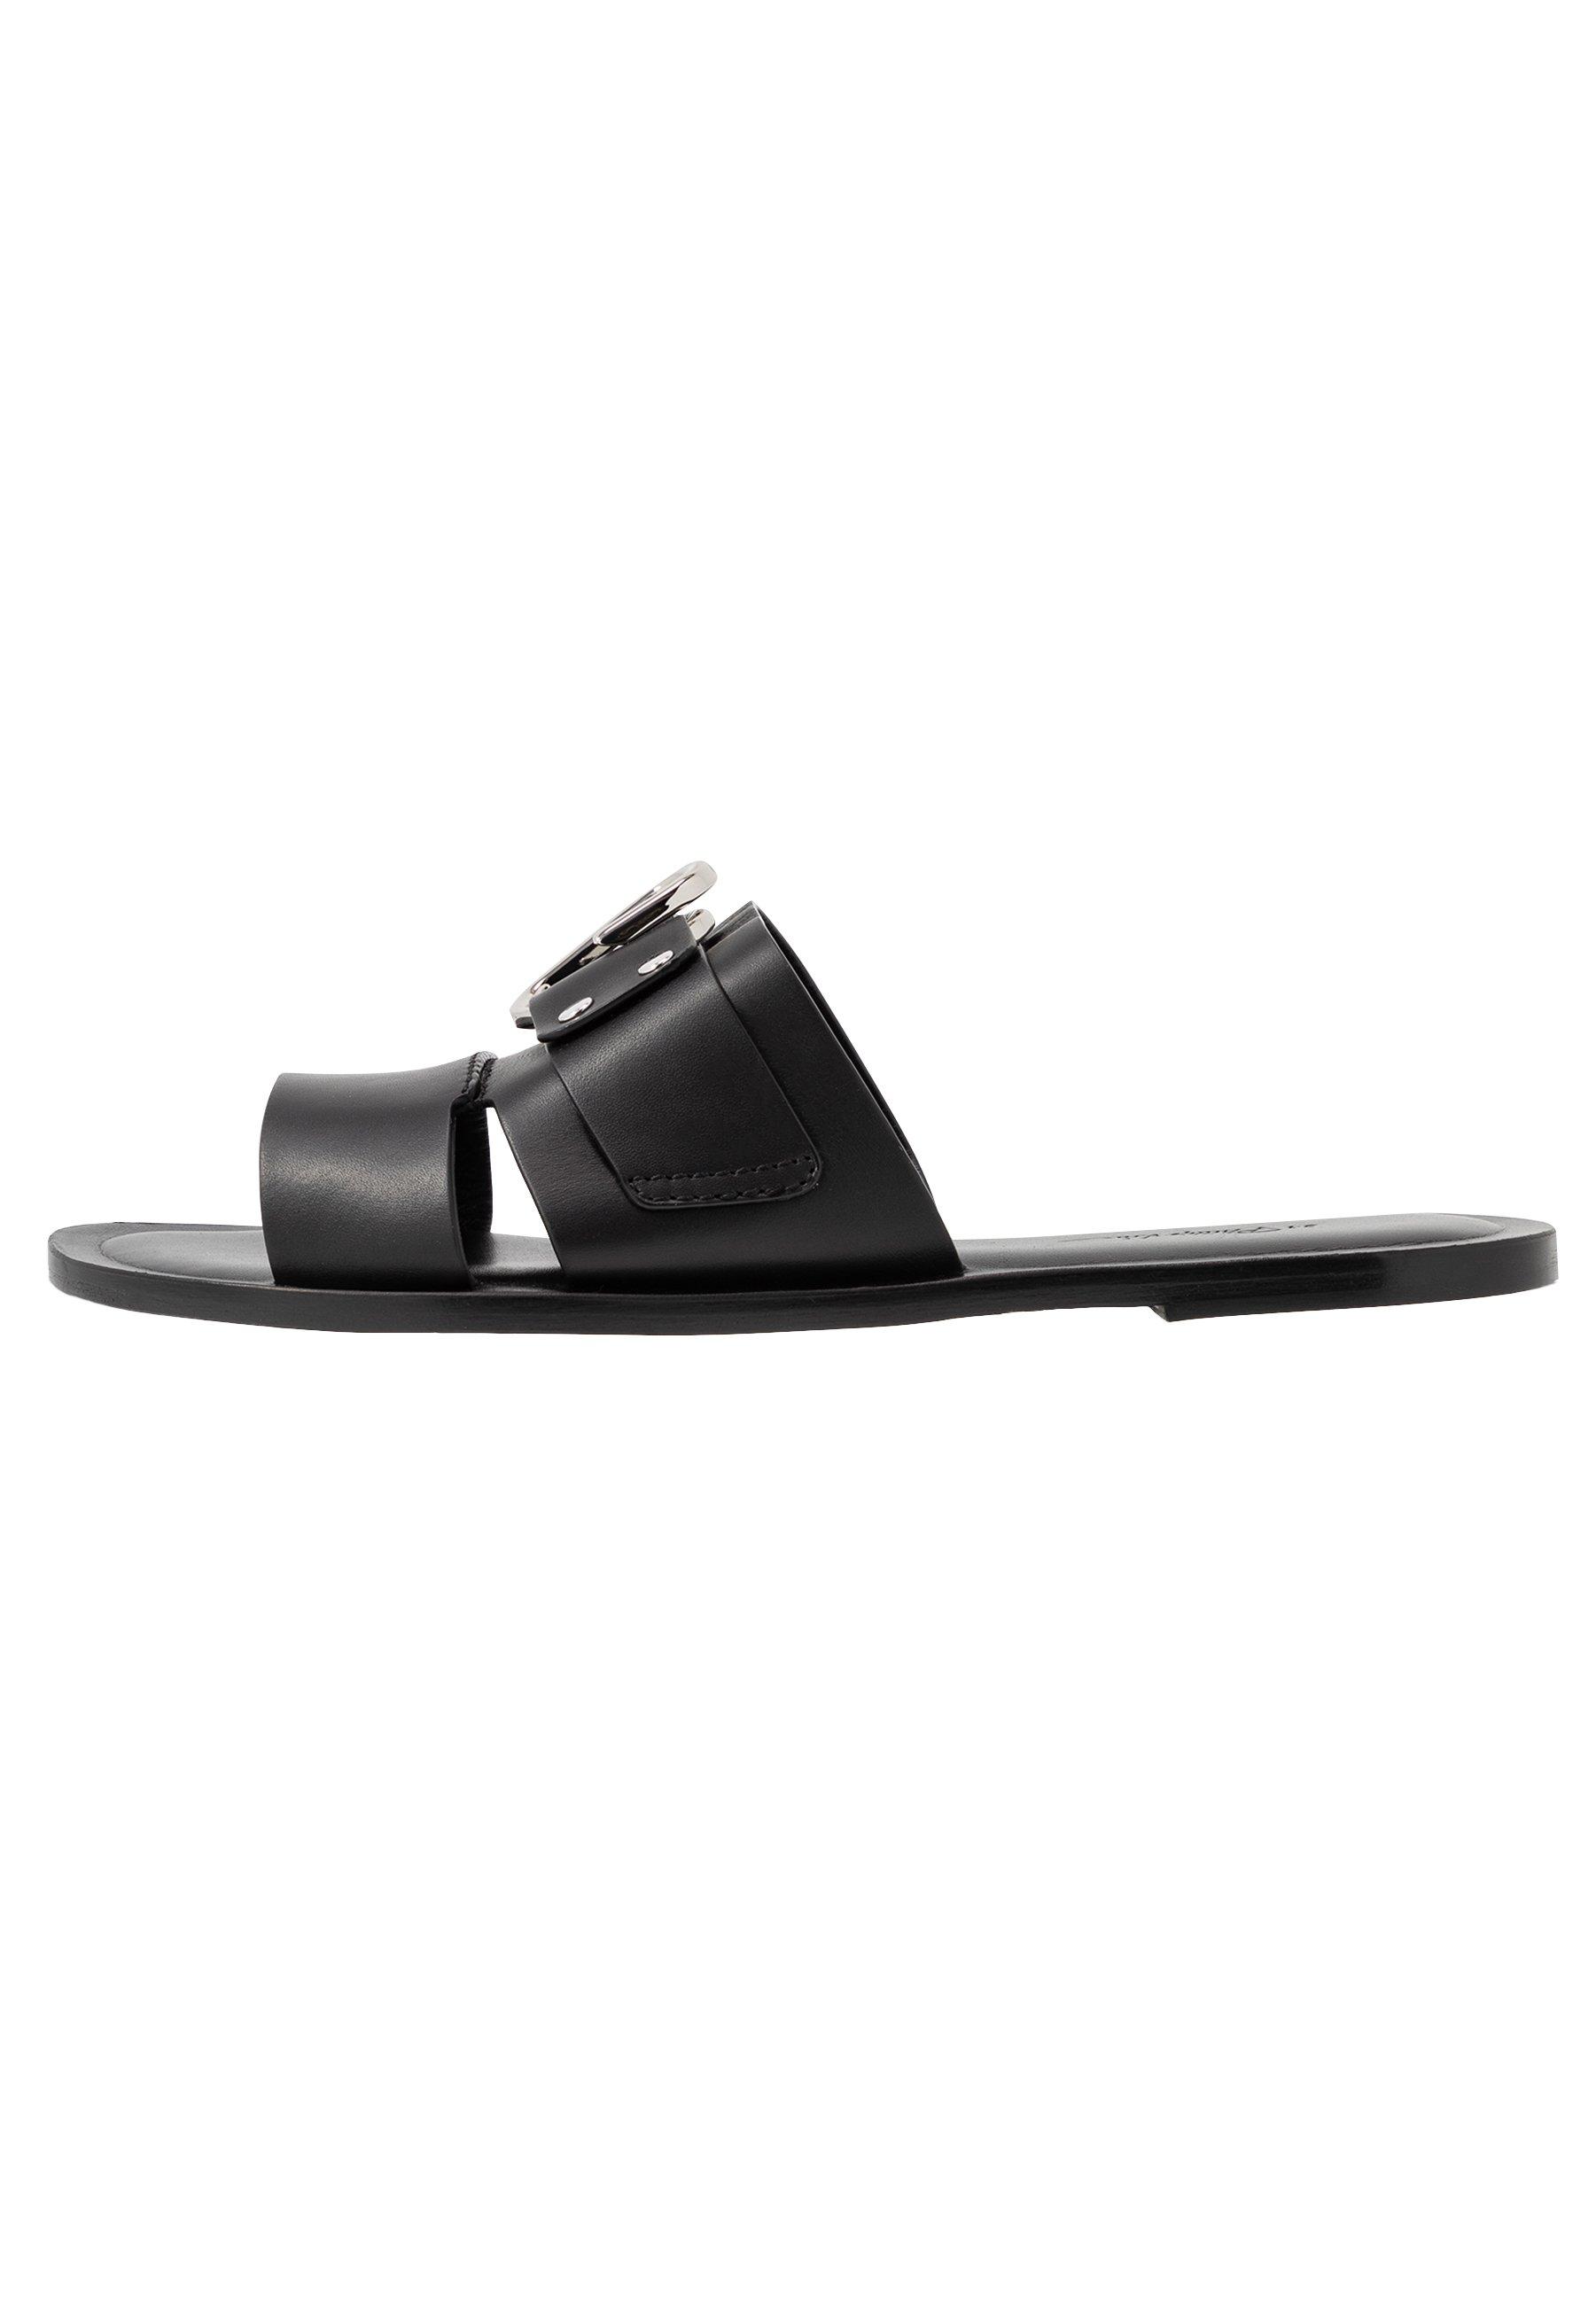 3.1 Phillip Lim Alix Flat Slide - Muiltjes Black Goedkope Schoenen